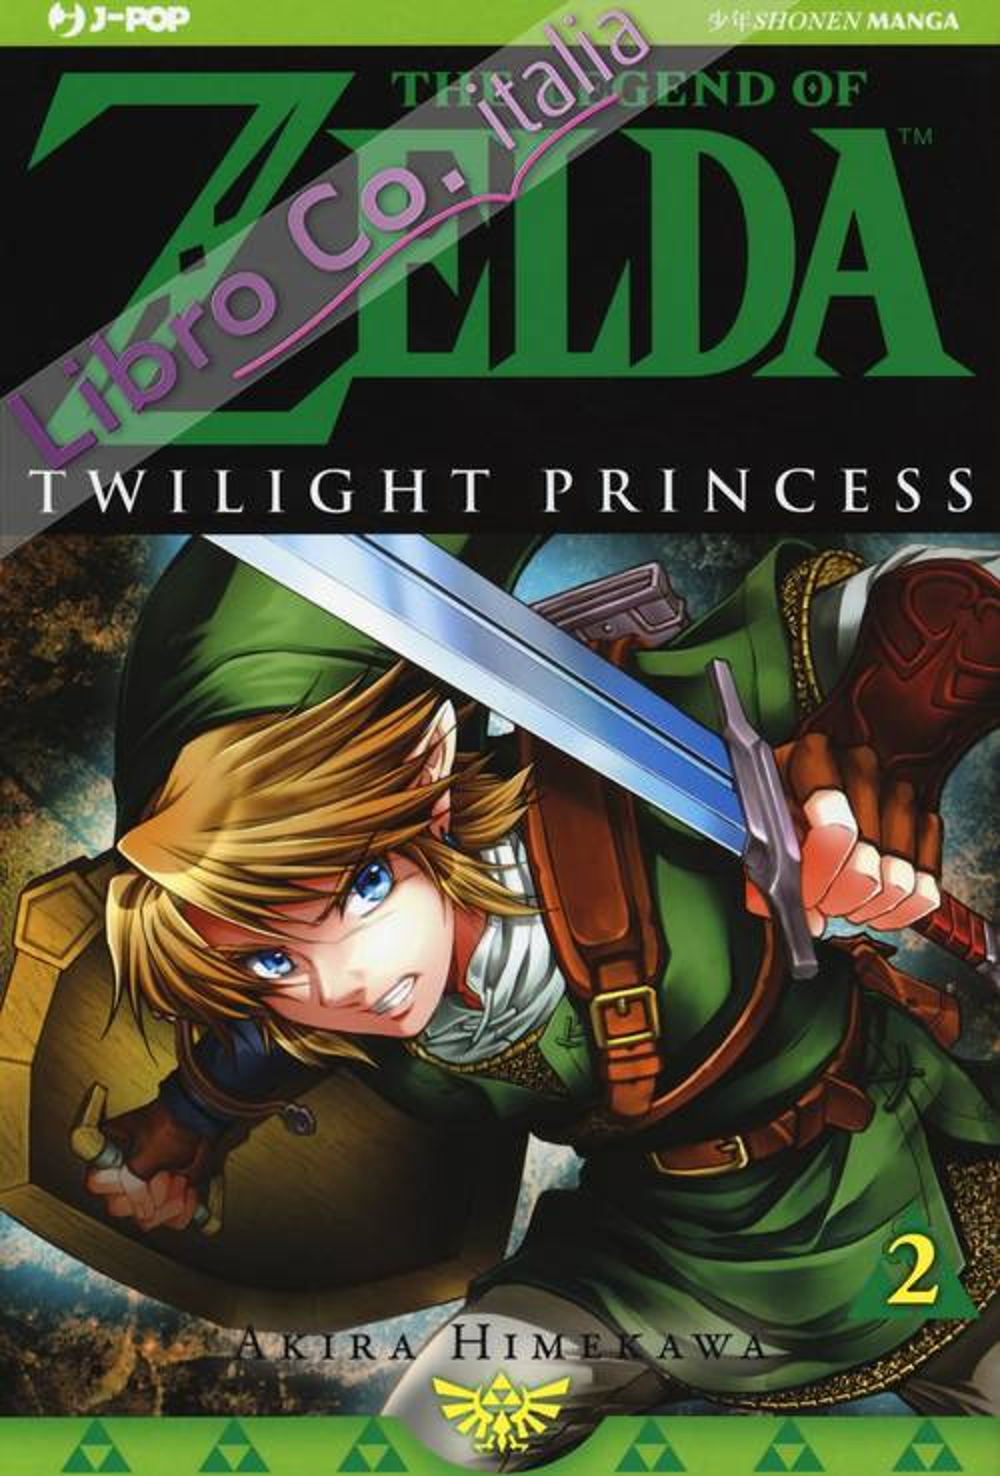 Twilight princess. The legend of Zelda. Vol. 2